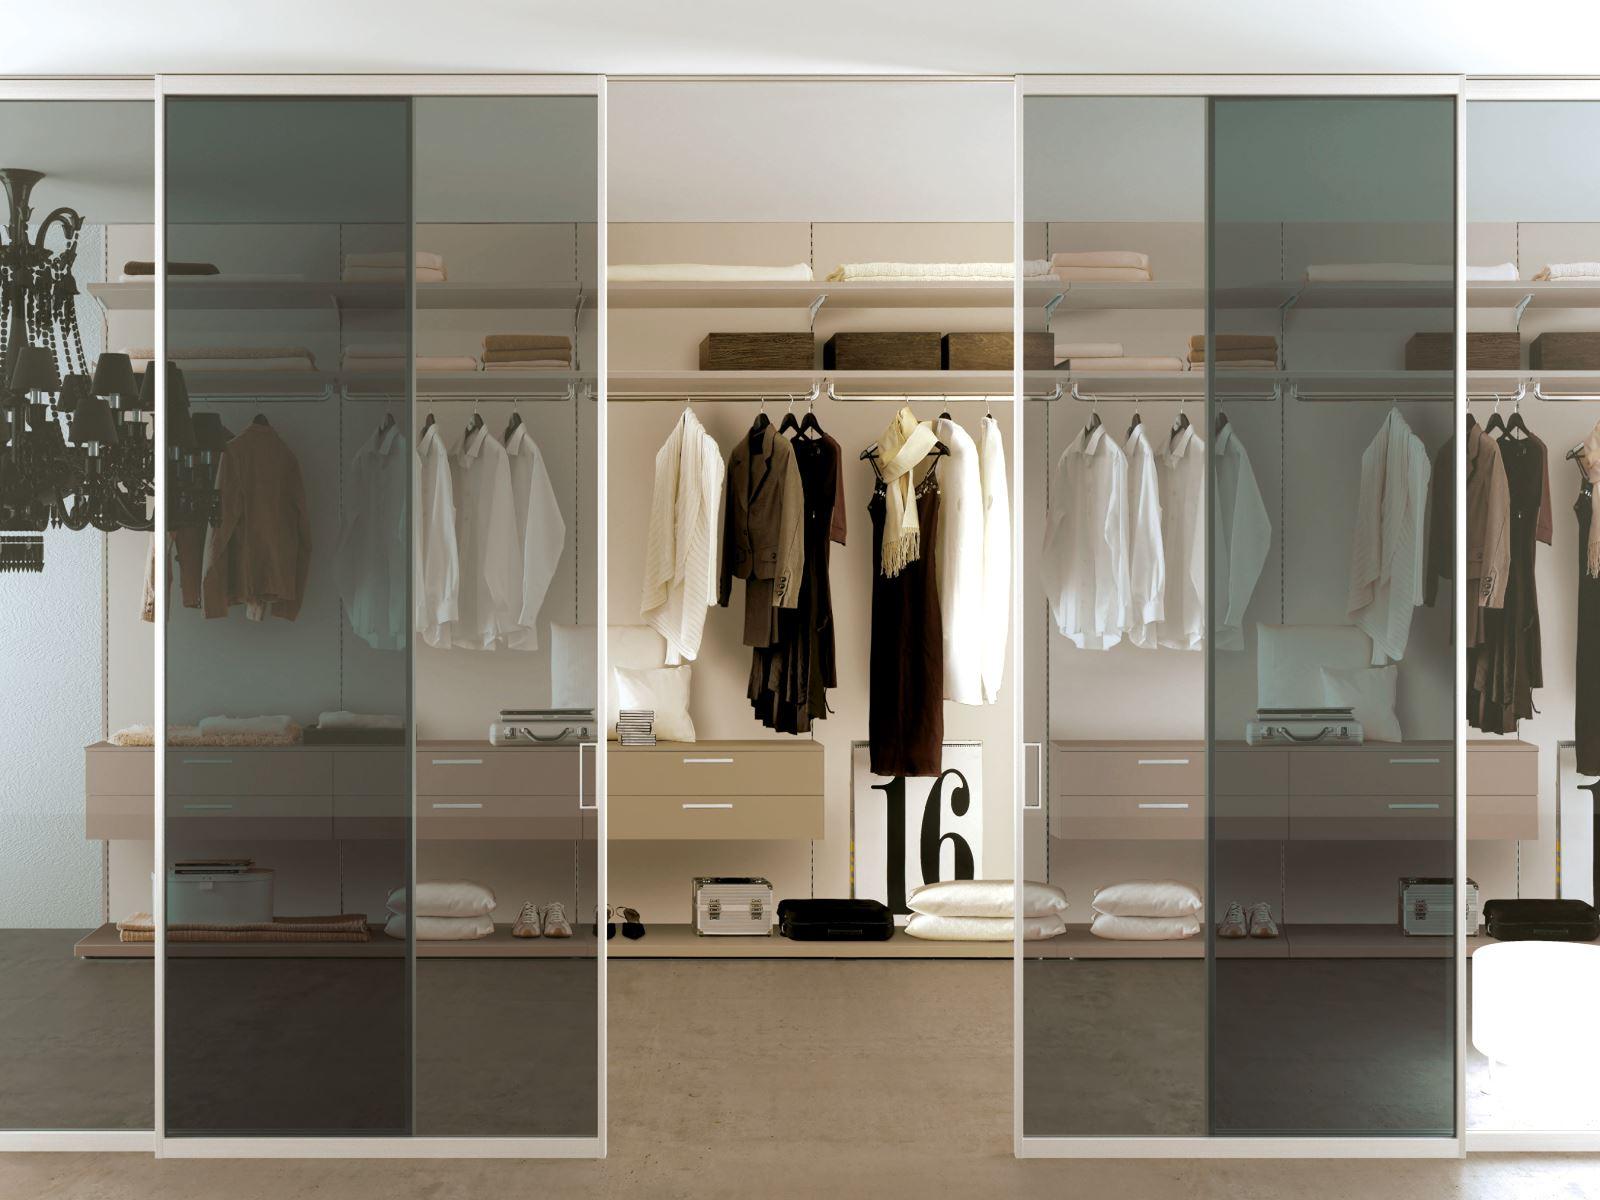 Cabine armadio mariotti casa - Cabine armadio online ...